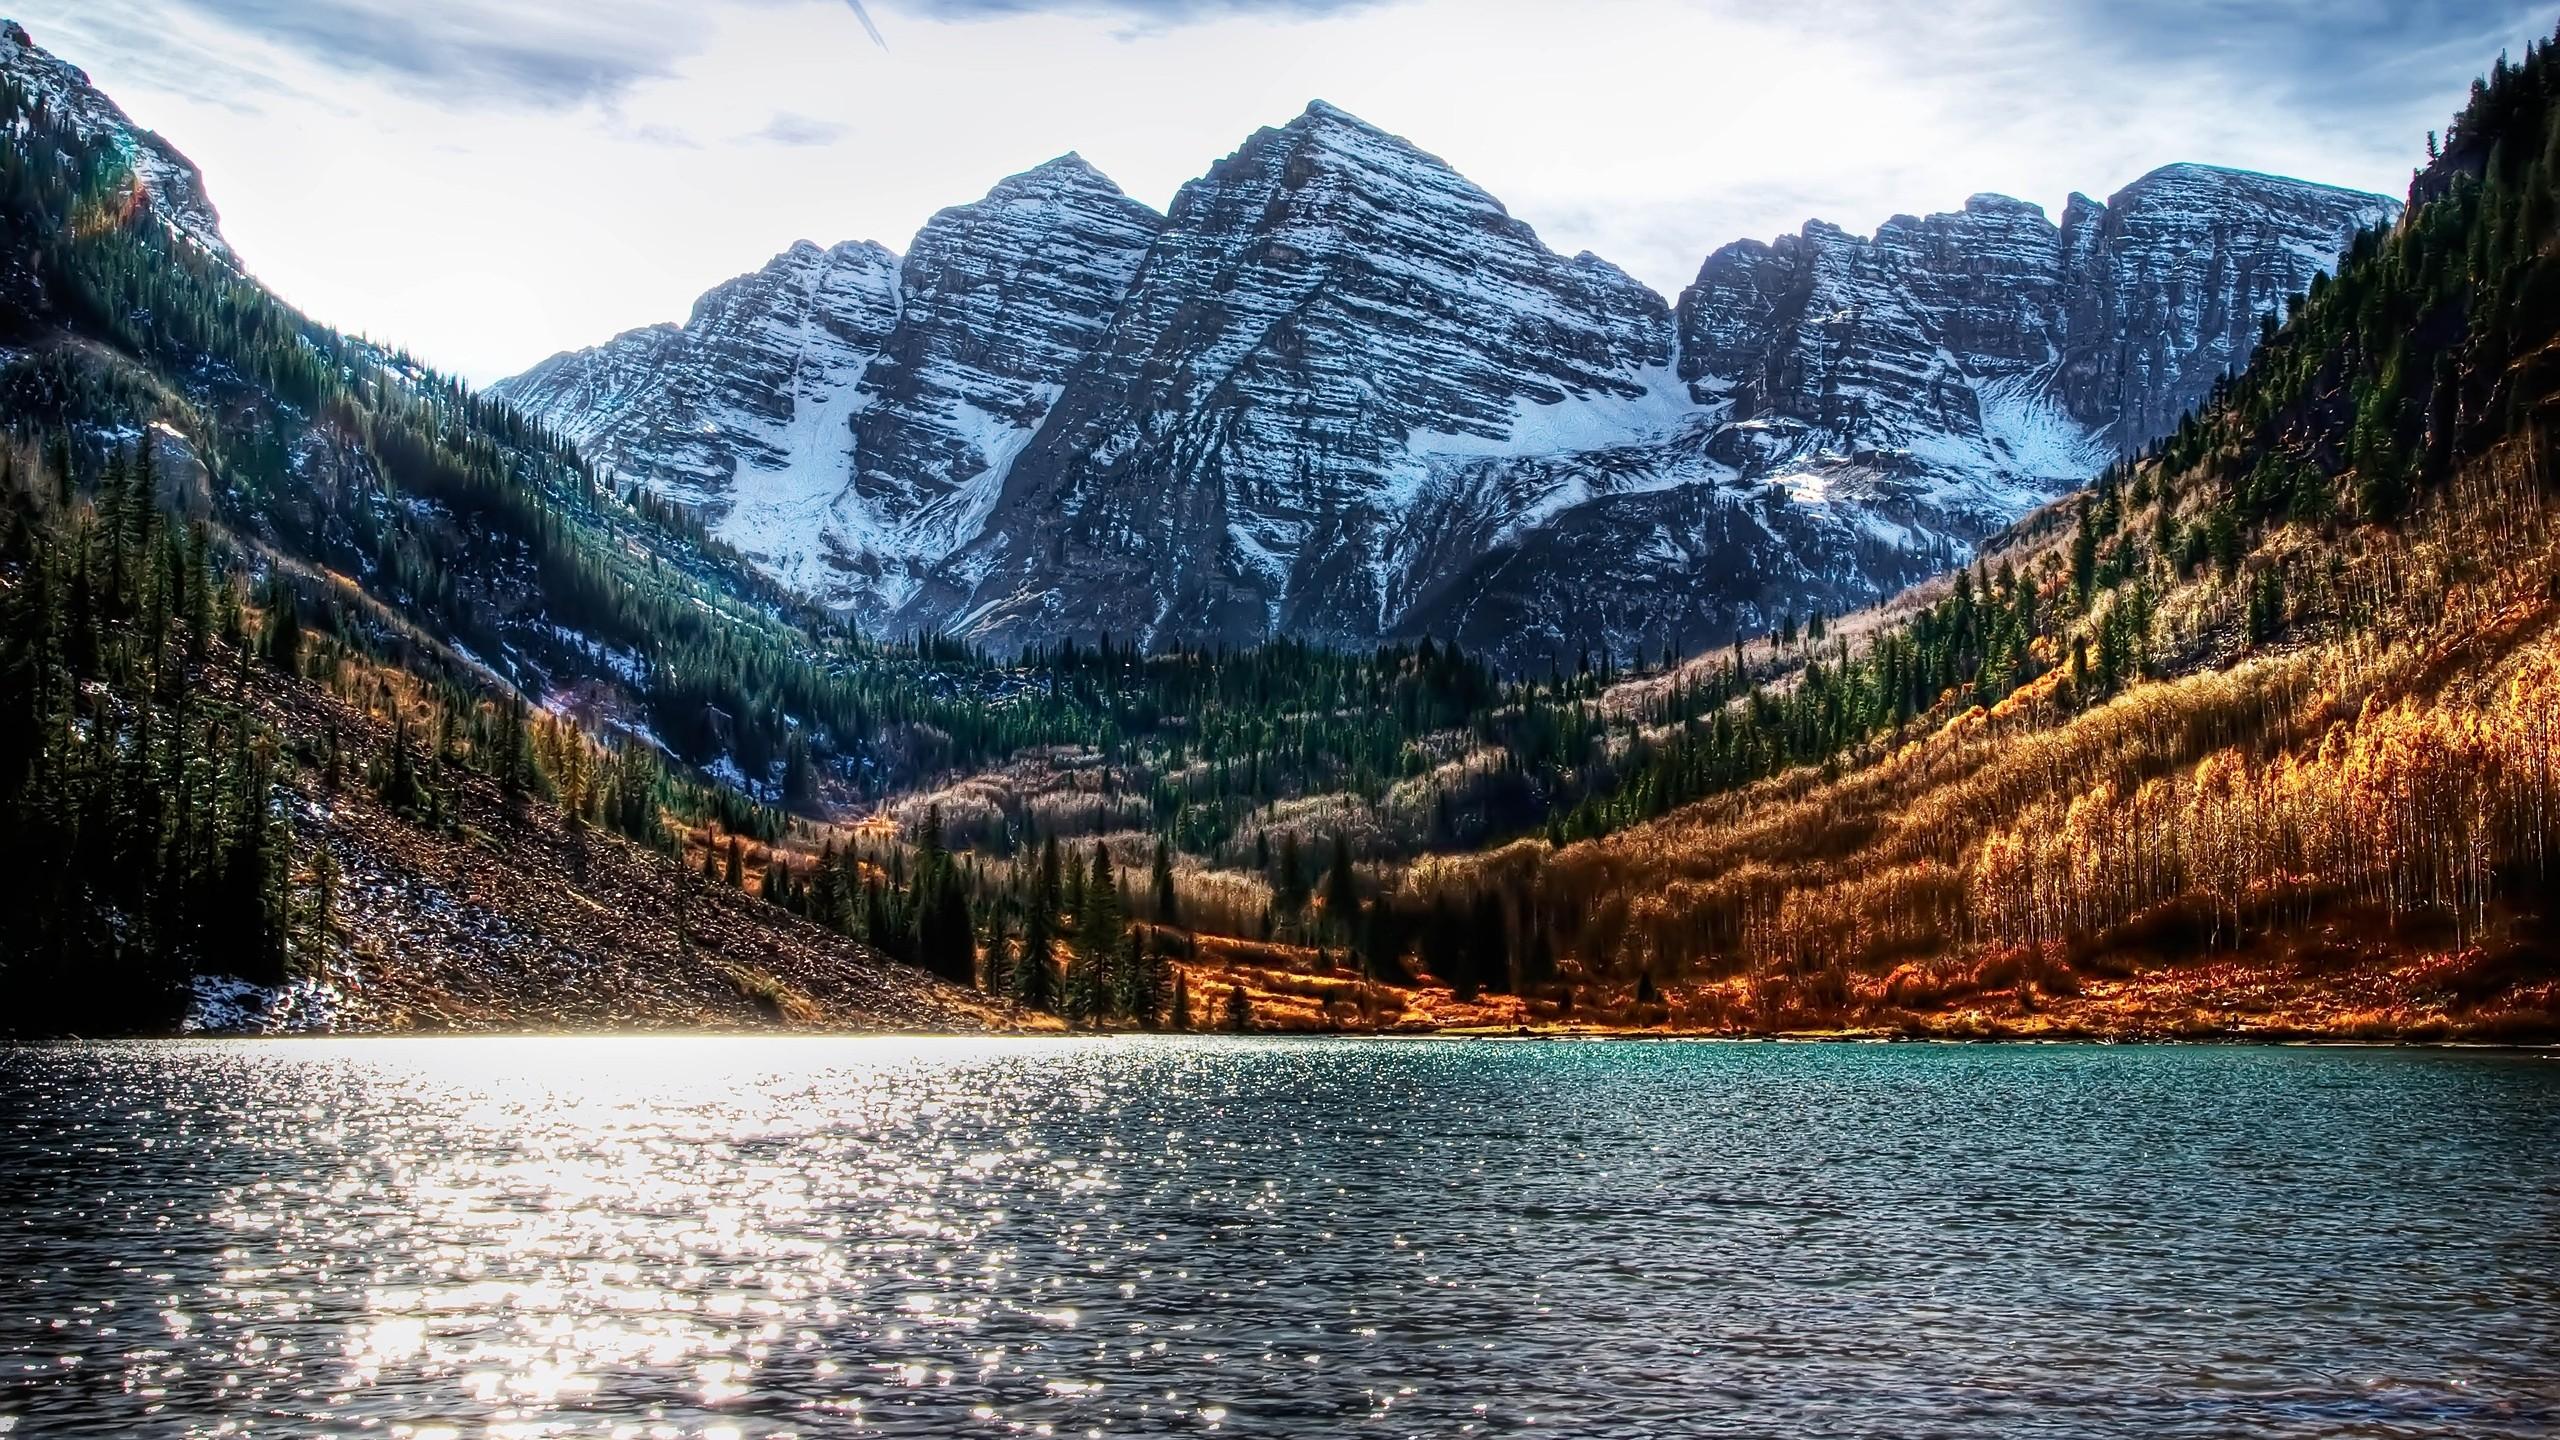 Colorado Mountains Hd Wallpaper Wallpapersafari